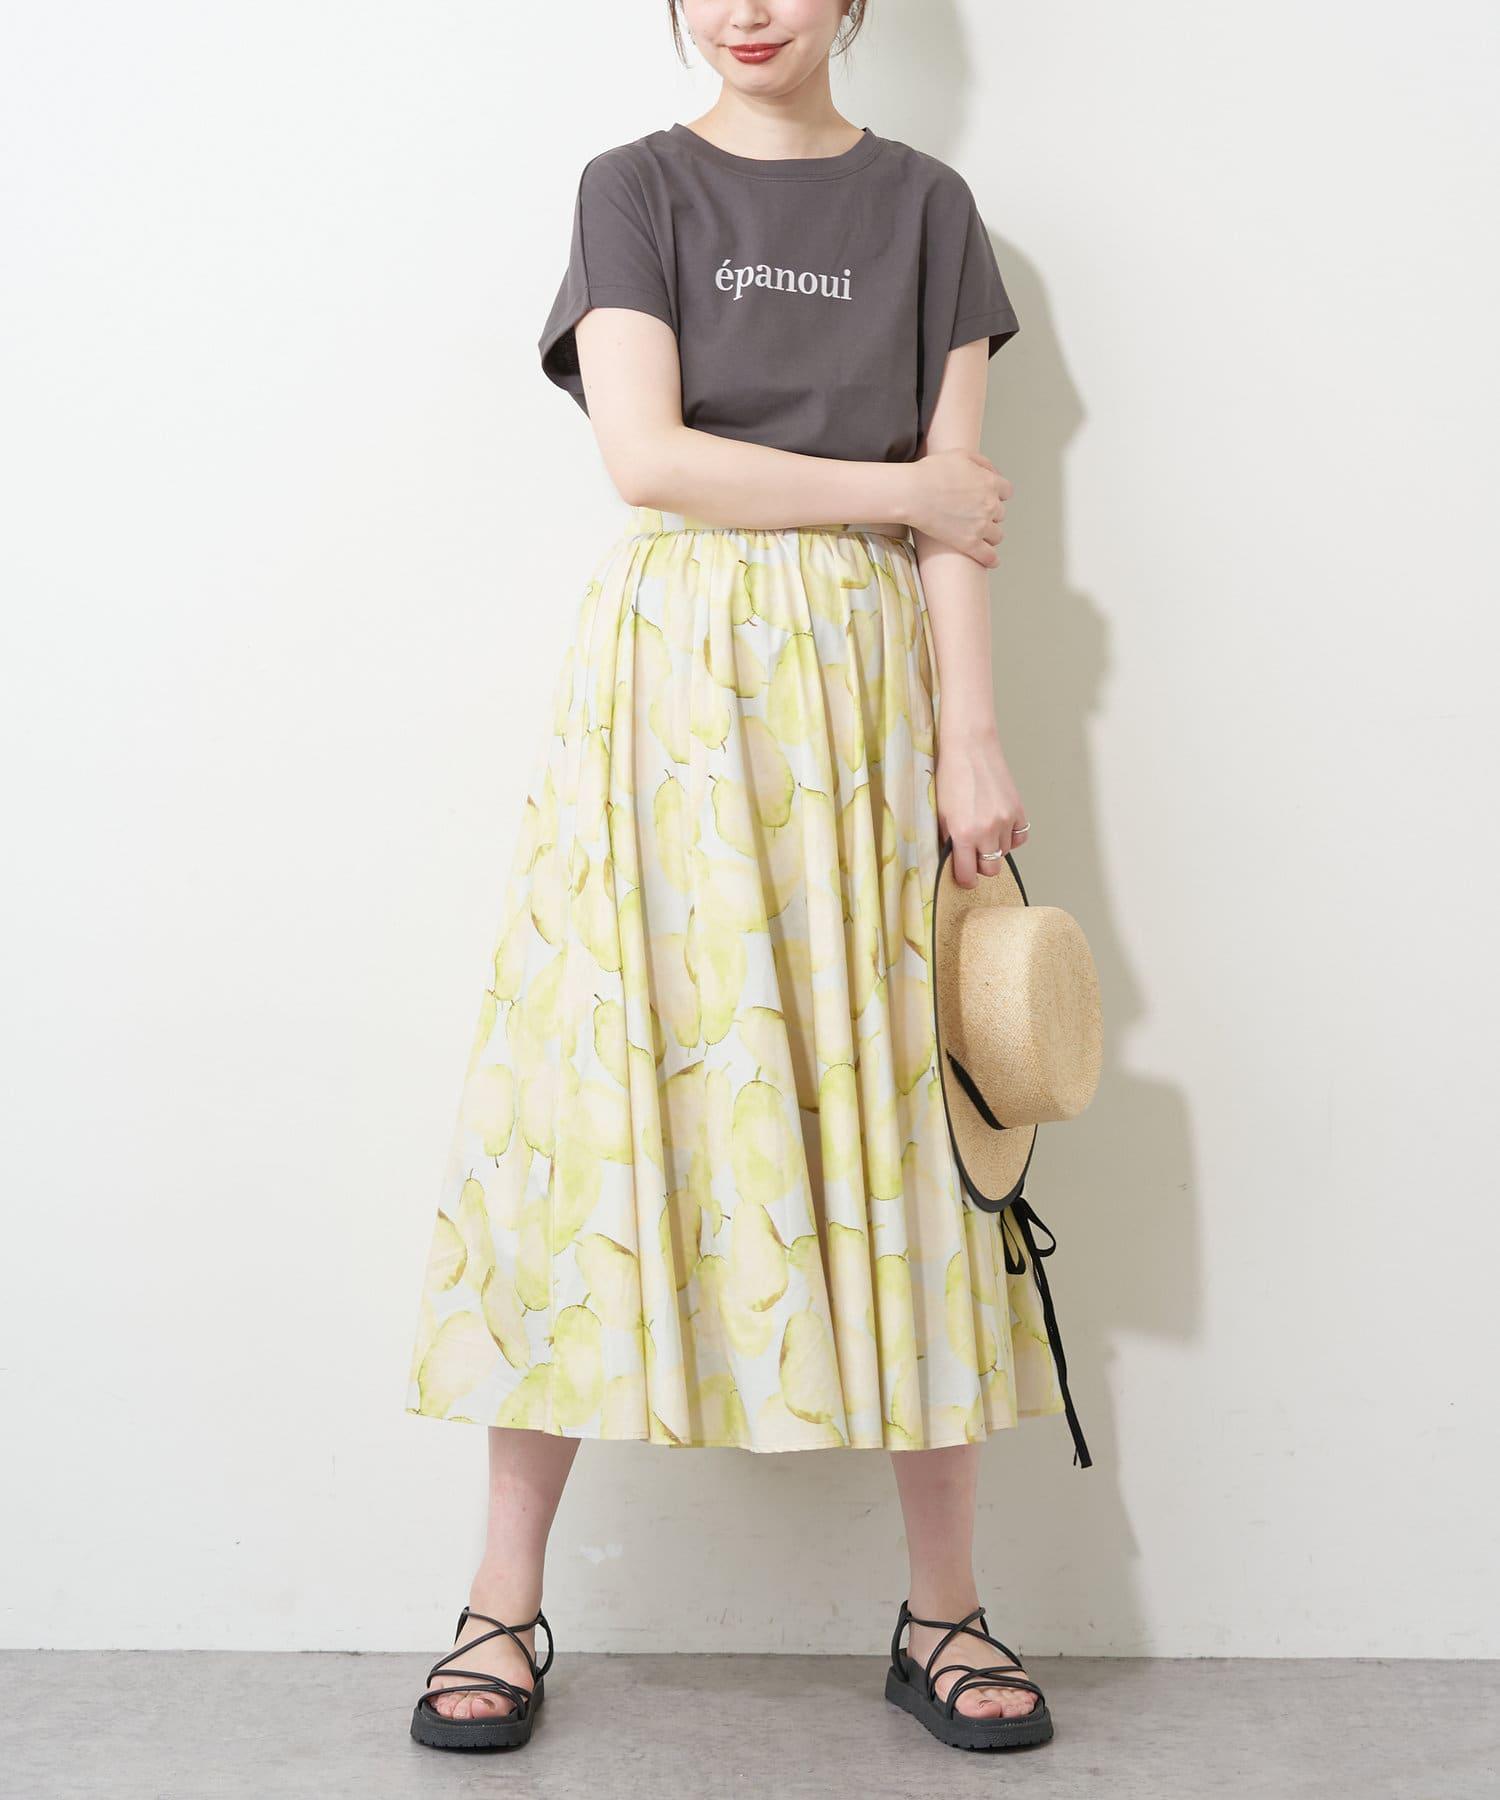 natural couture(ナチュラルクチュール) 厚手 e panoui ロゴT